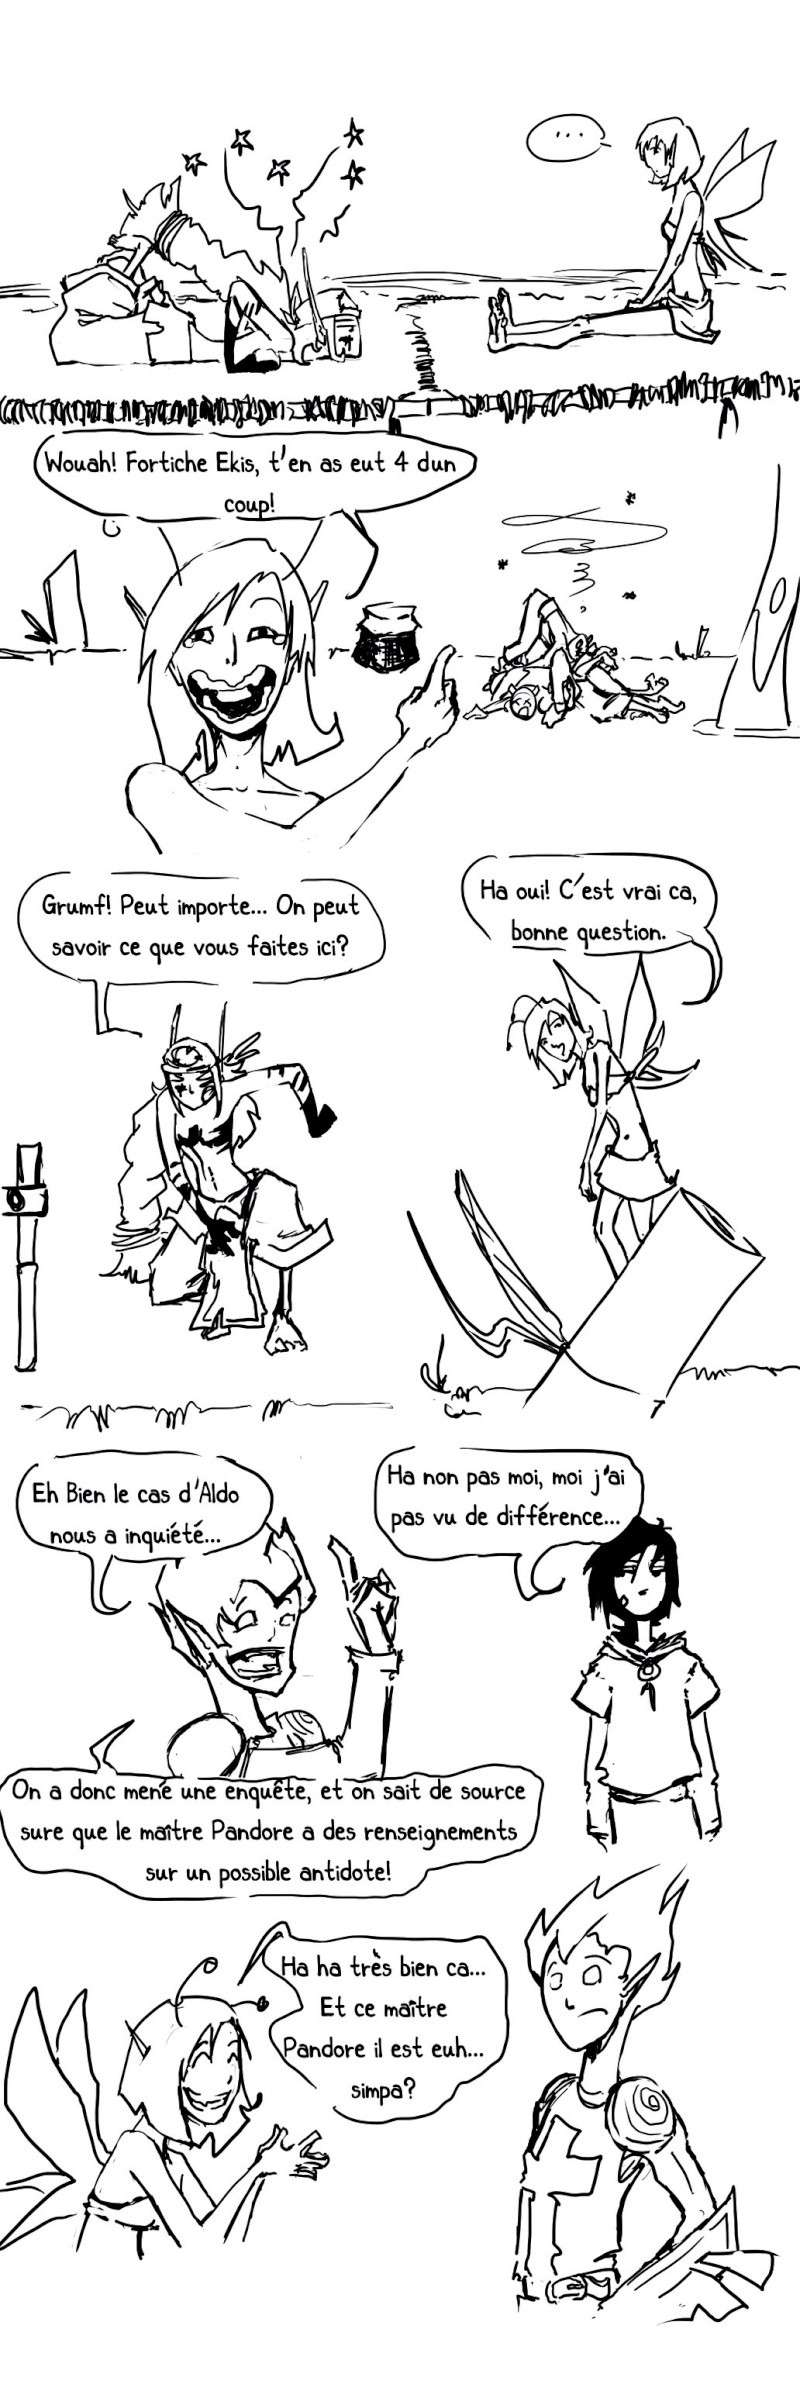 seik et ekis, les aventures ILLUSTREES - Page 2 Strip319